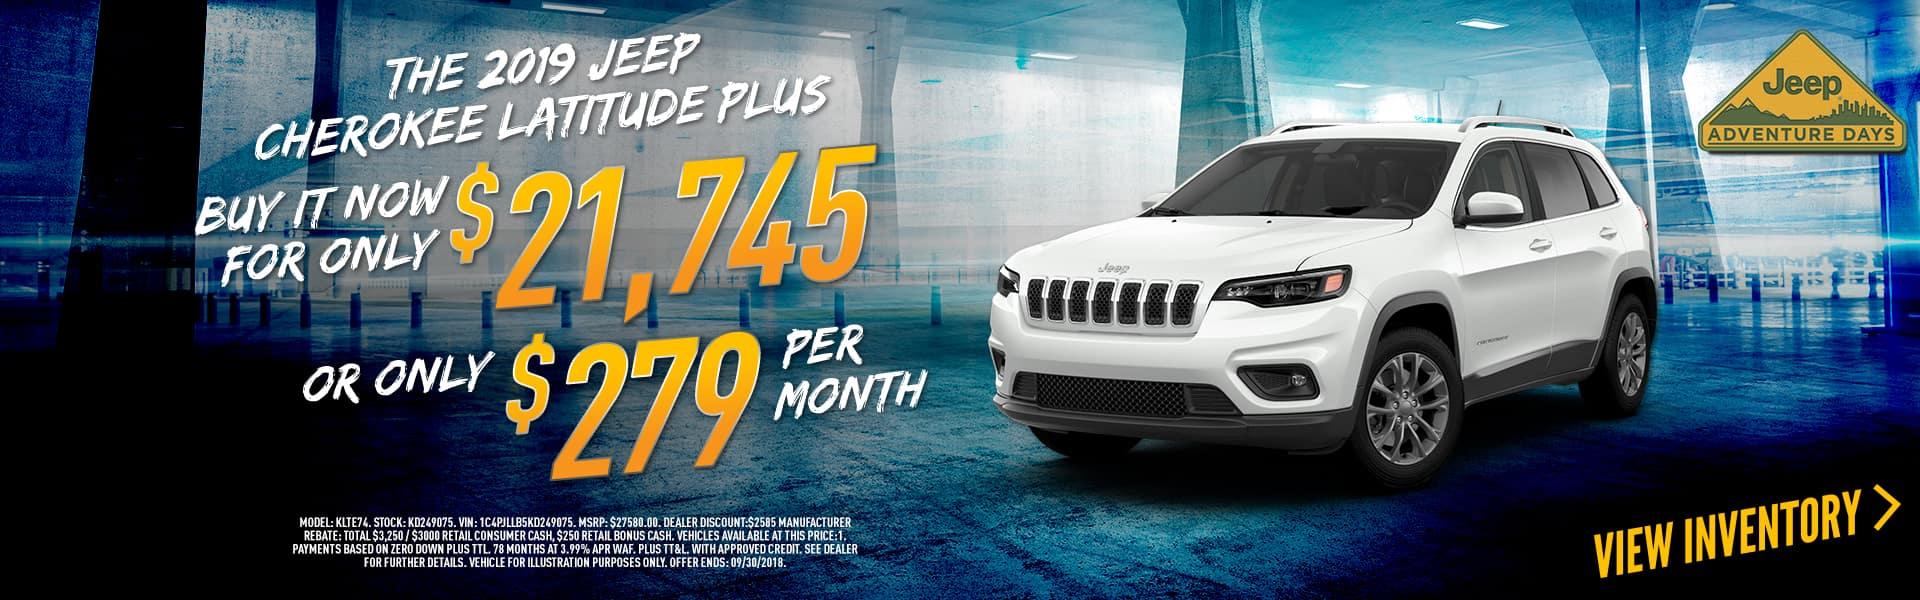 2019-jeep-cherokee-beaumont-tx-deals-near-me